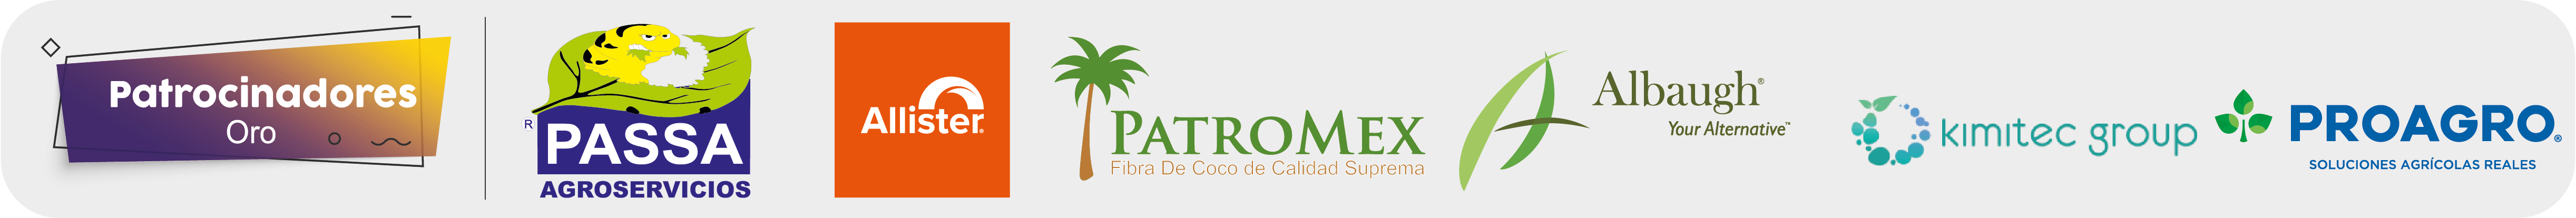 https://fitosanidad.com/wp-content/uploads/2019/08/Slide-Patrocinadores_6.png